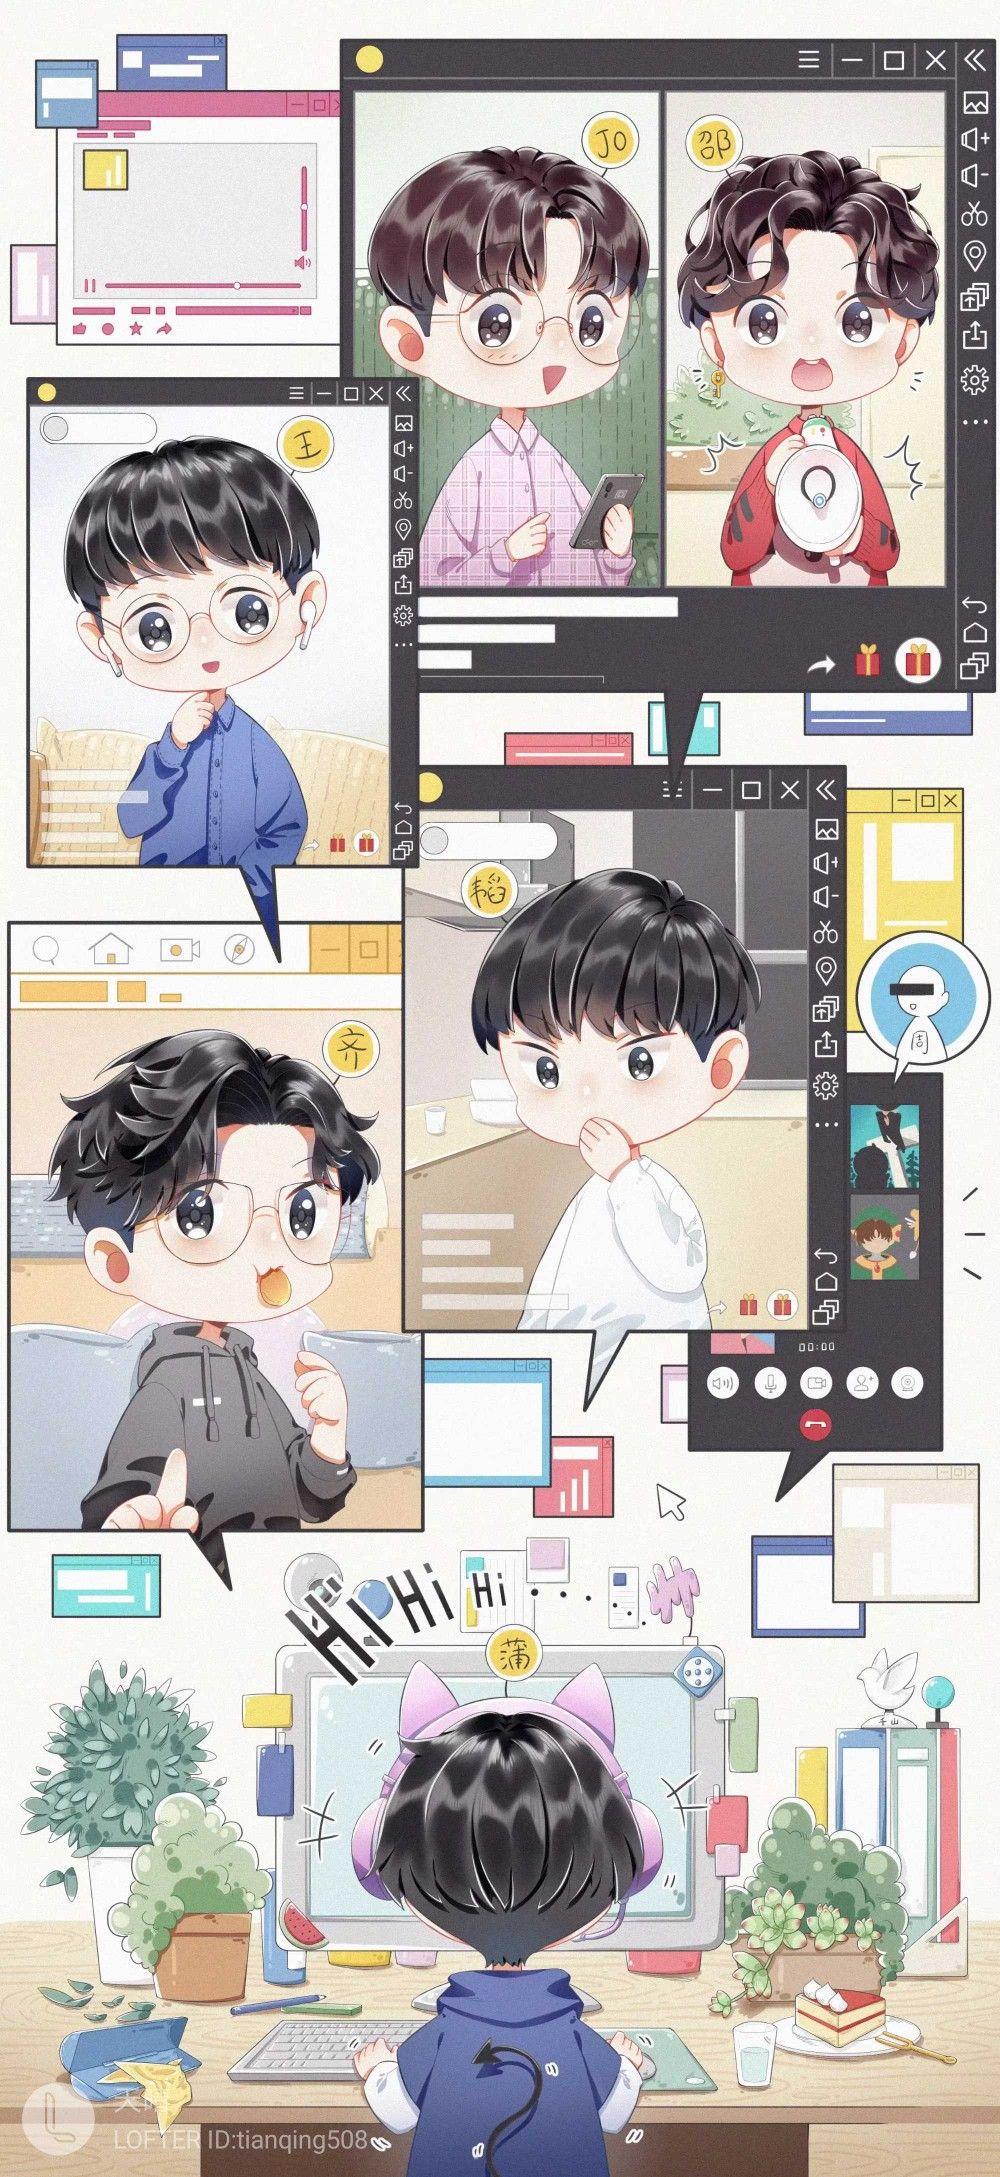 pin by goh juan on iphone wallpaper iphone wallpaper anime wallpaper